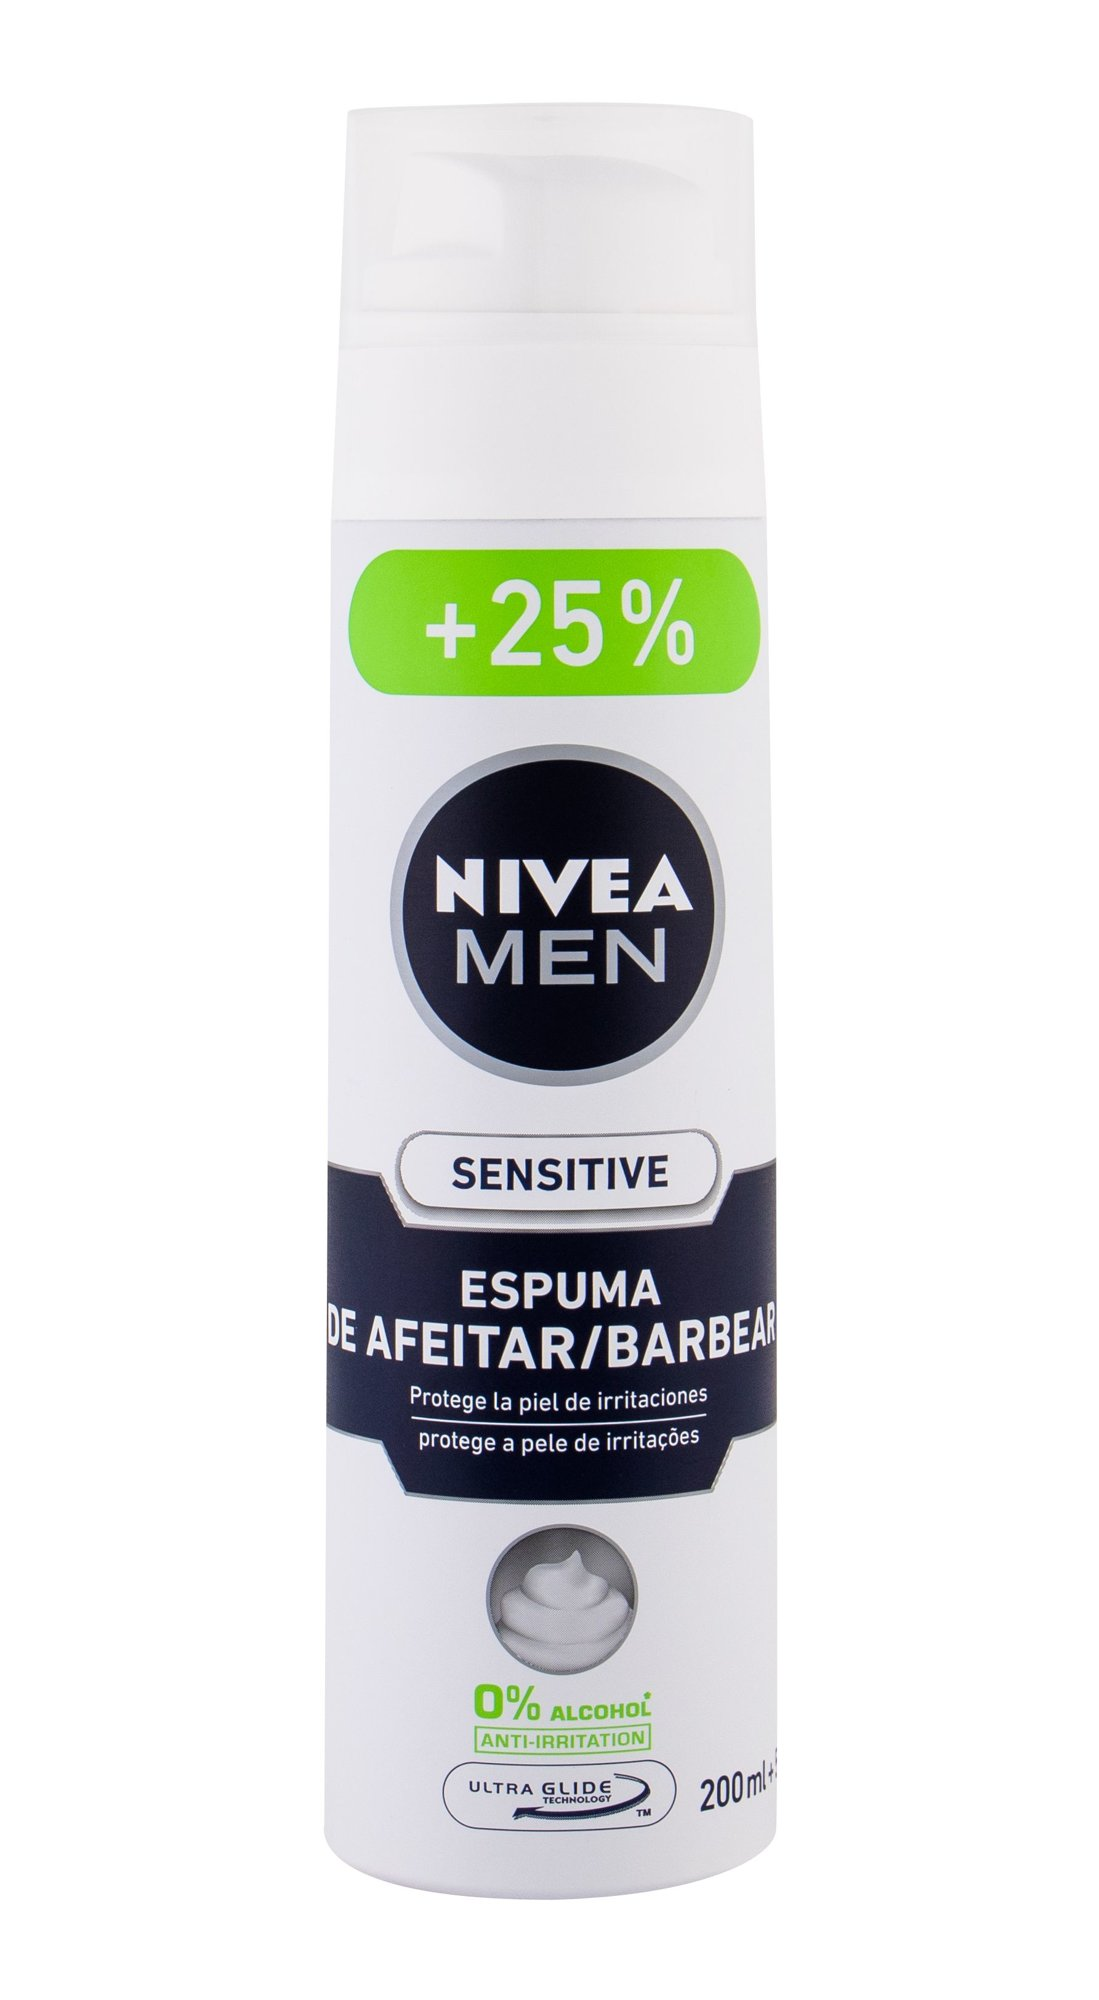 Nivea Men Sensitive Shaving Foam 250ml